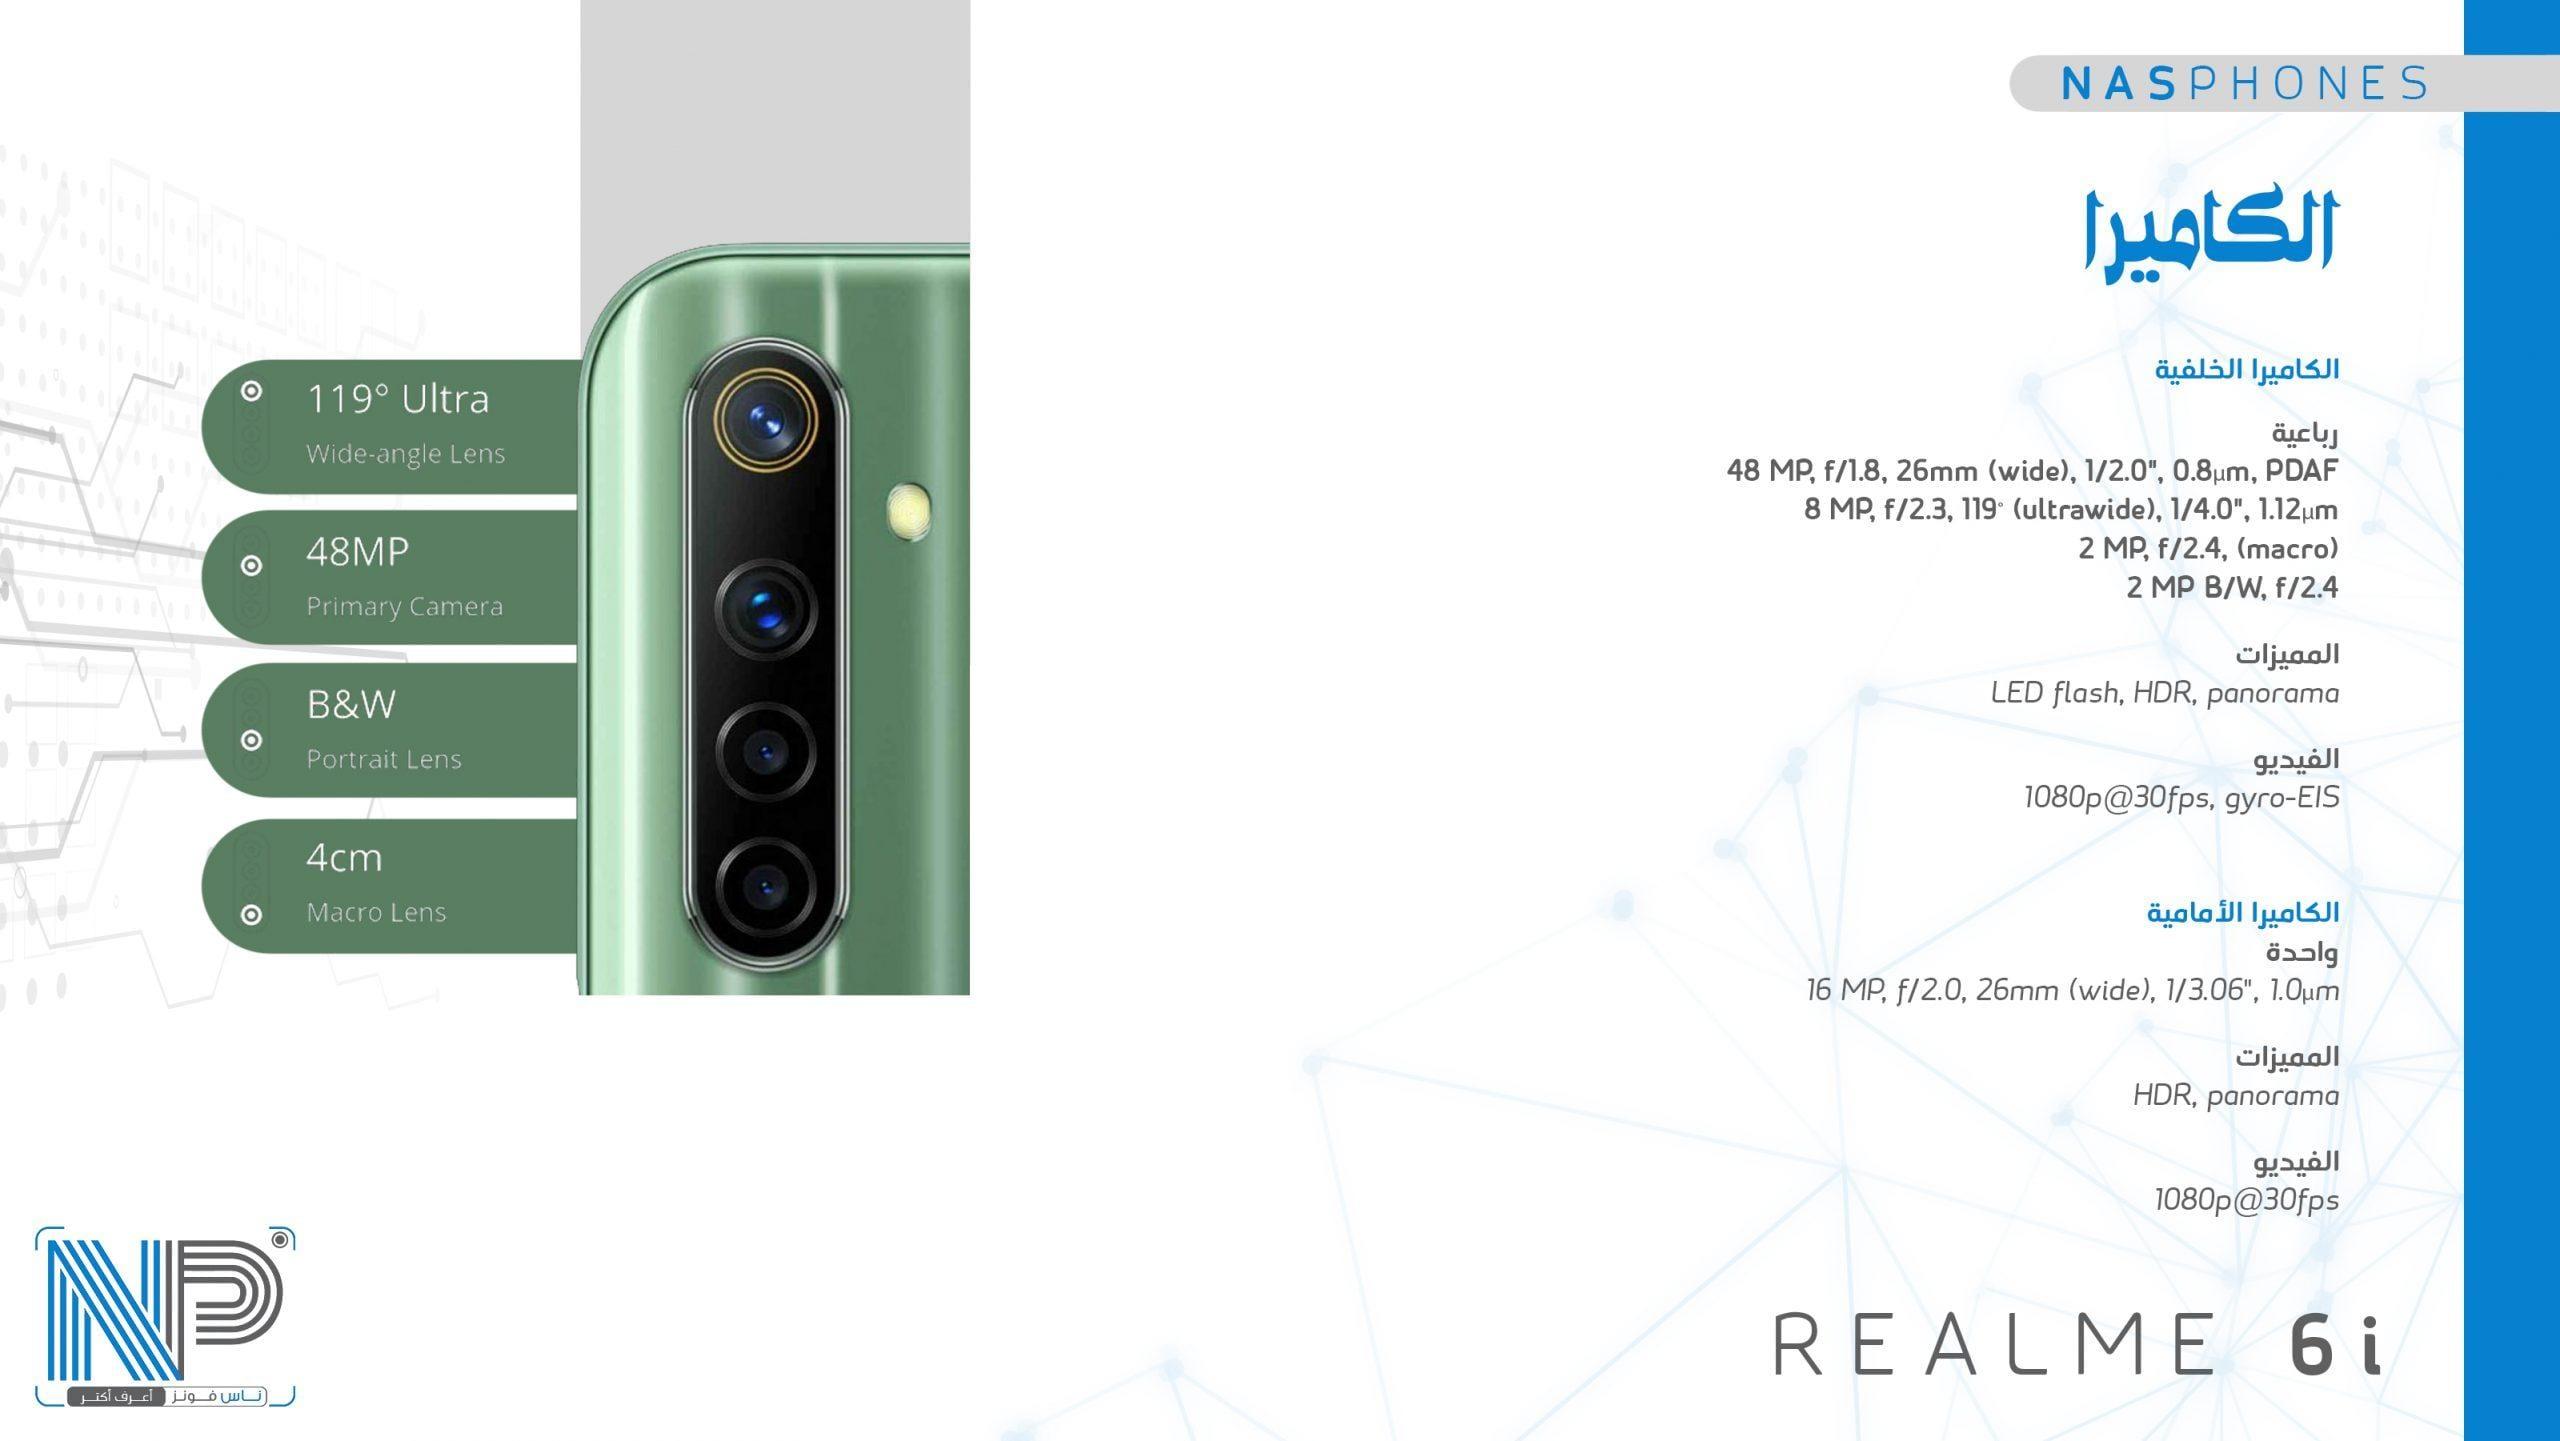 كاميرات موبايل ريلمي 6i: